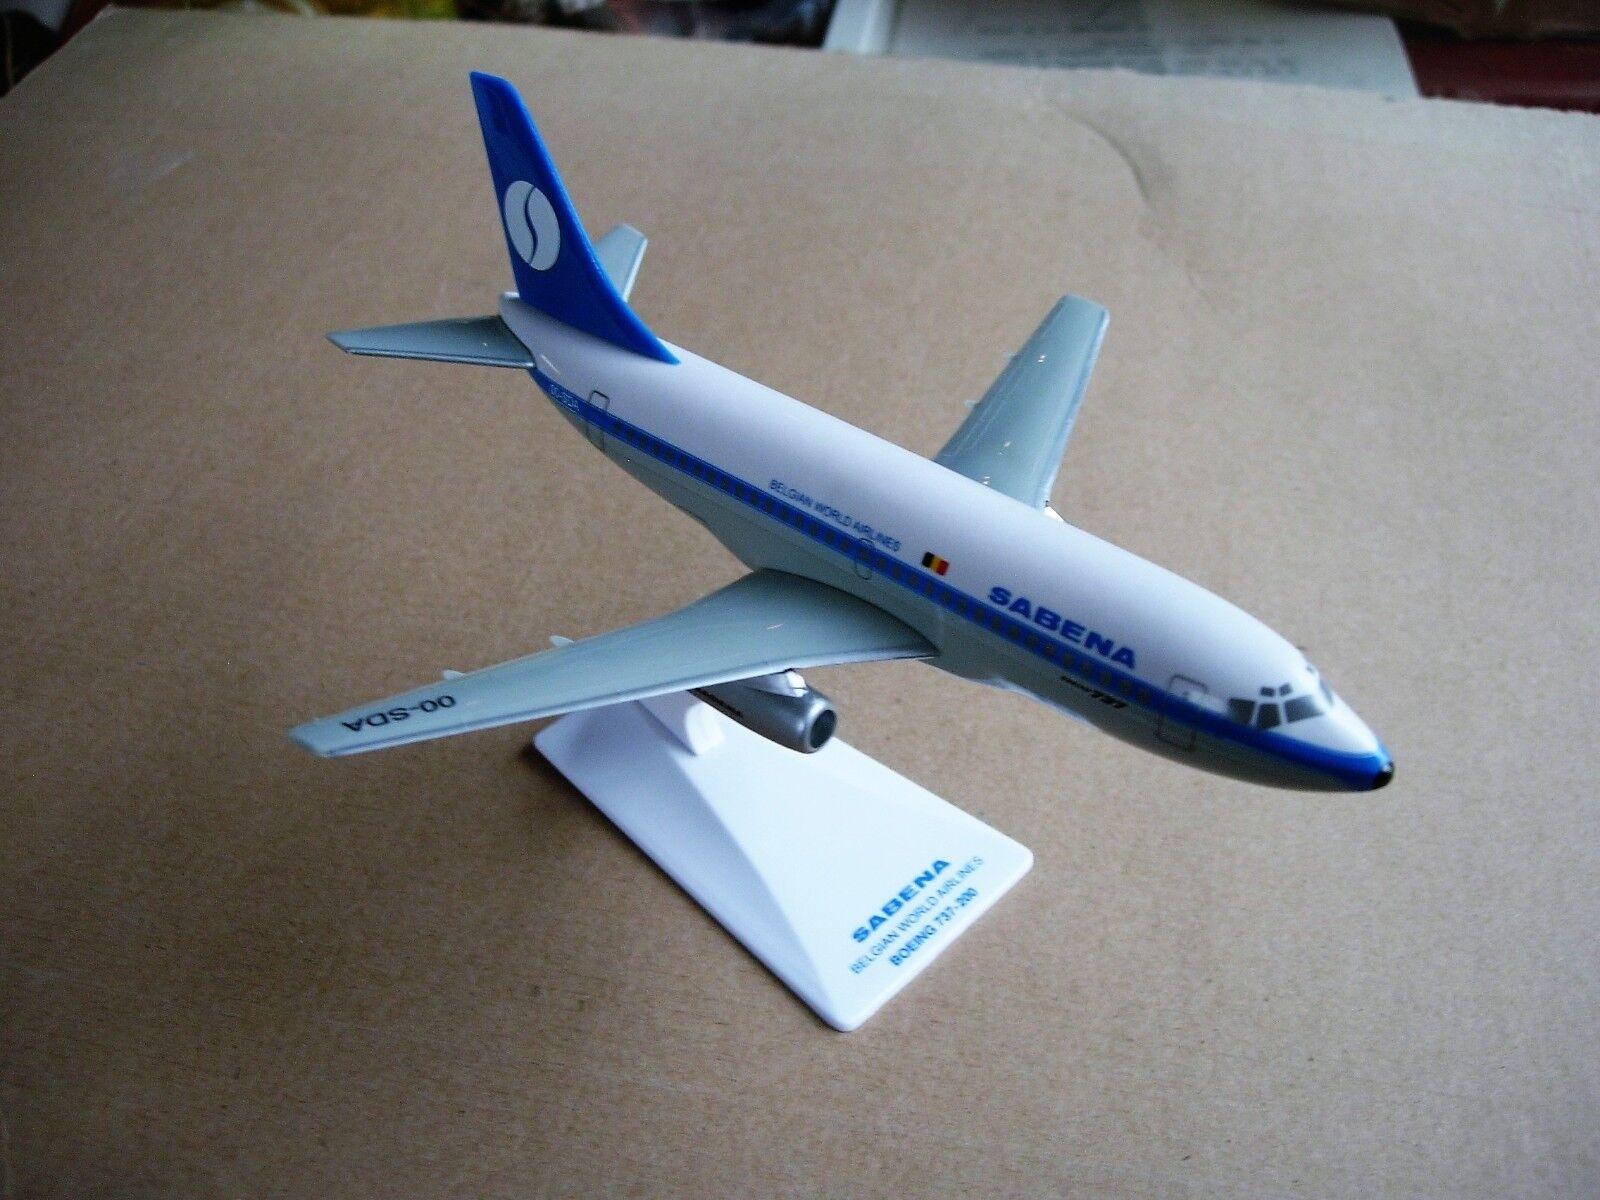 Sabena miniatuurvliegtuig Boeing B737-200 schaal 1/200 met originele doos.L:17cm